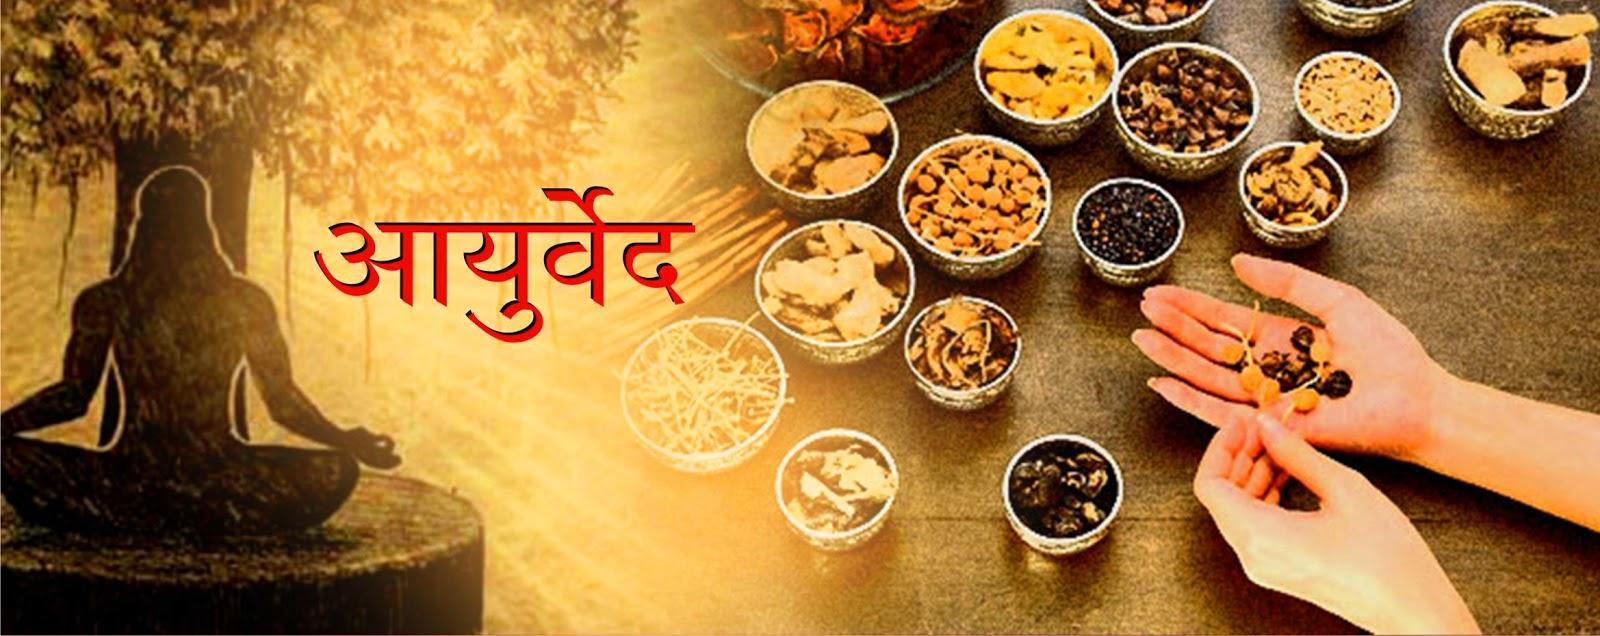 ayurvedic Drug cultivation in himachal